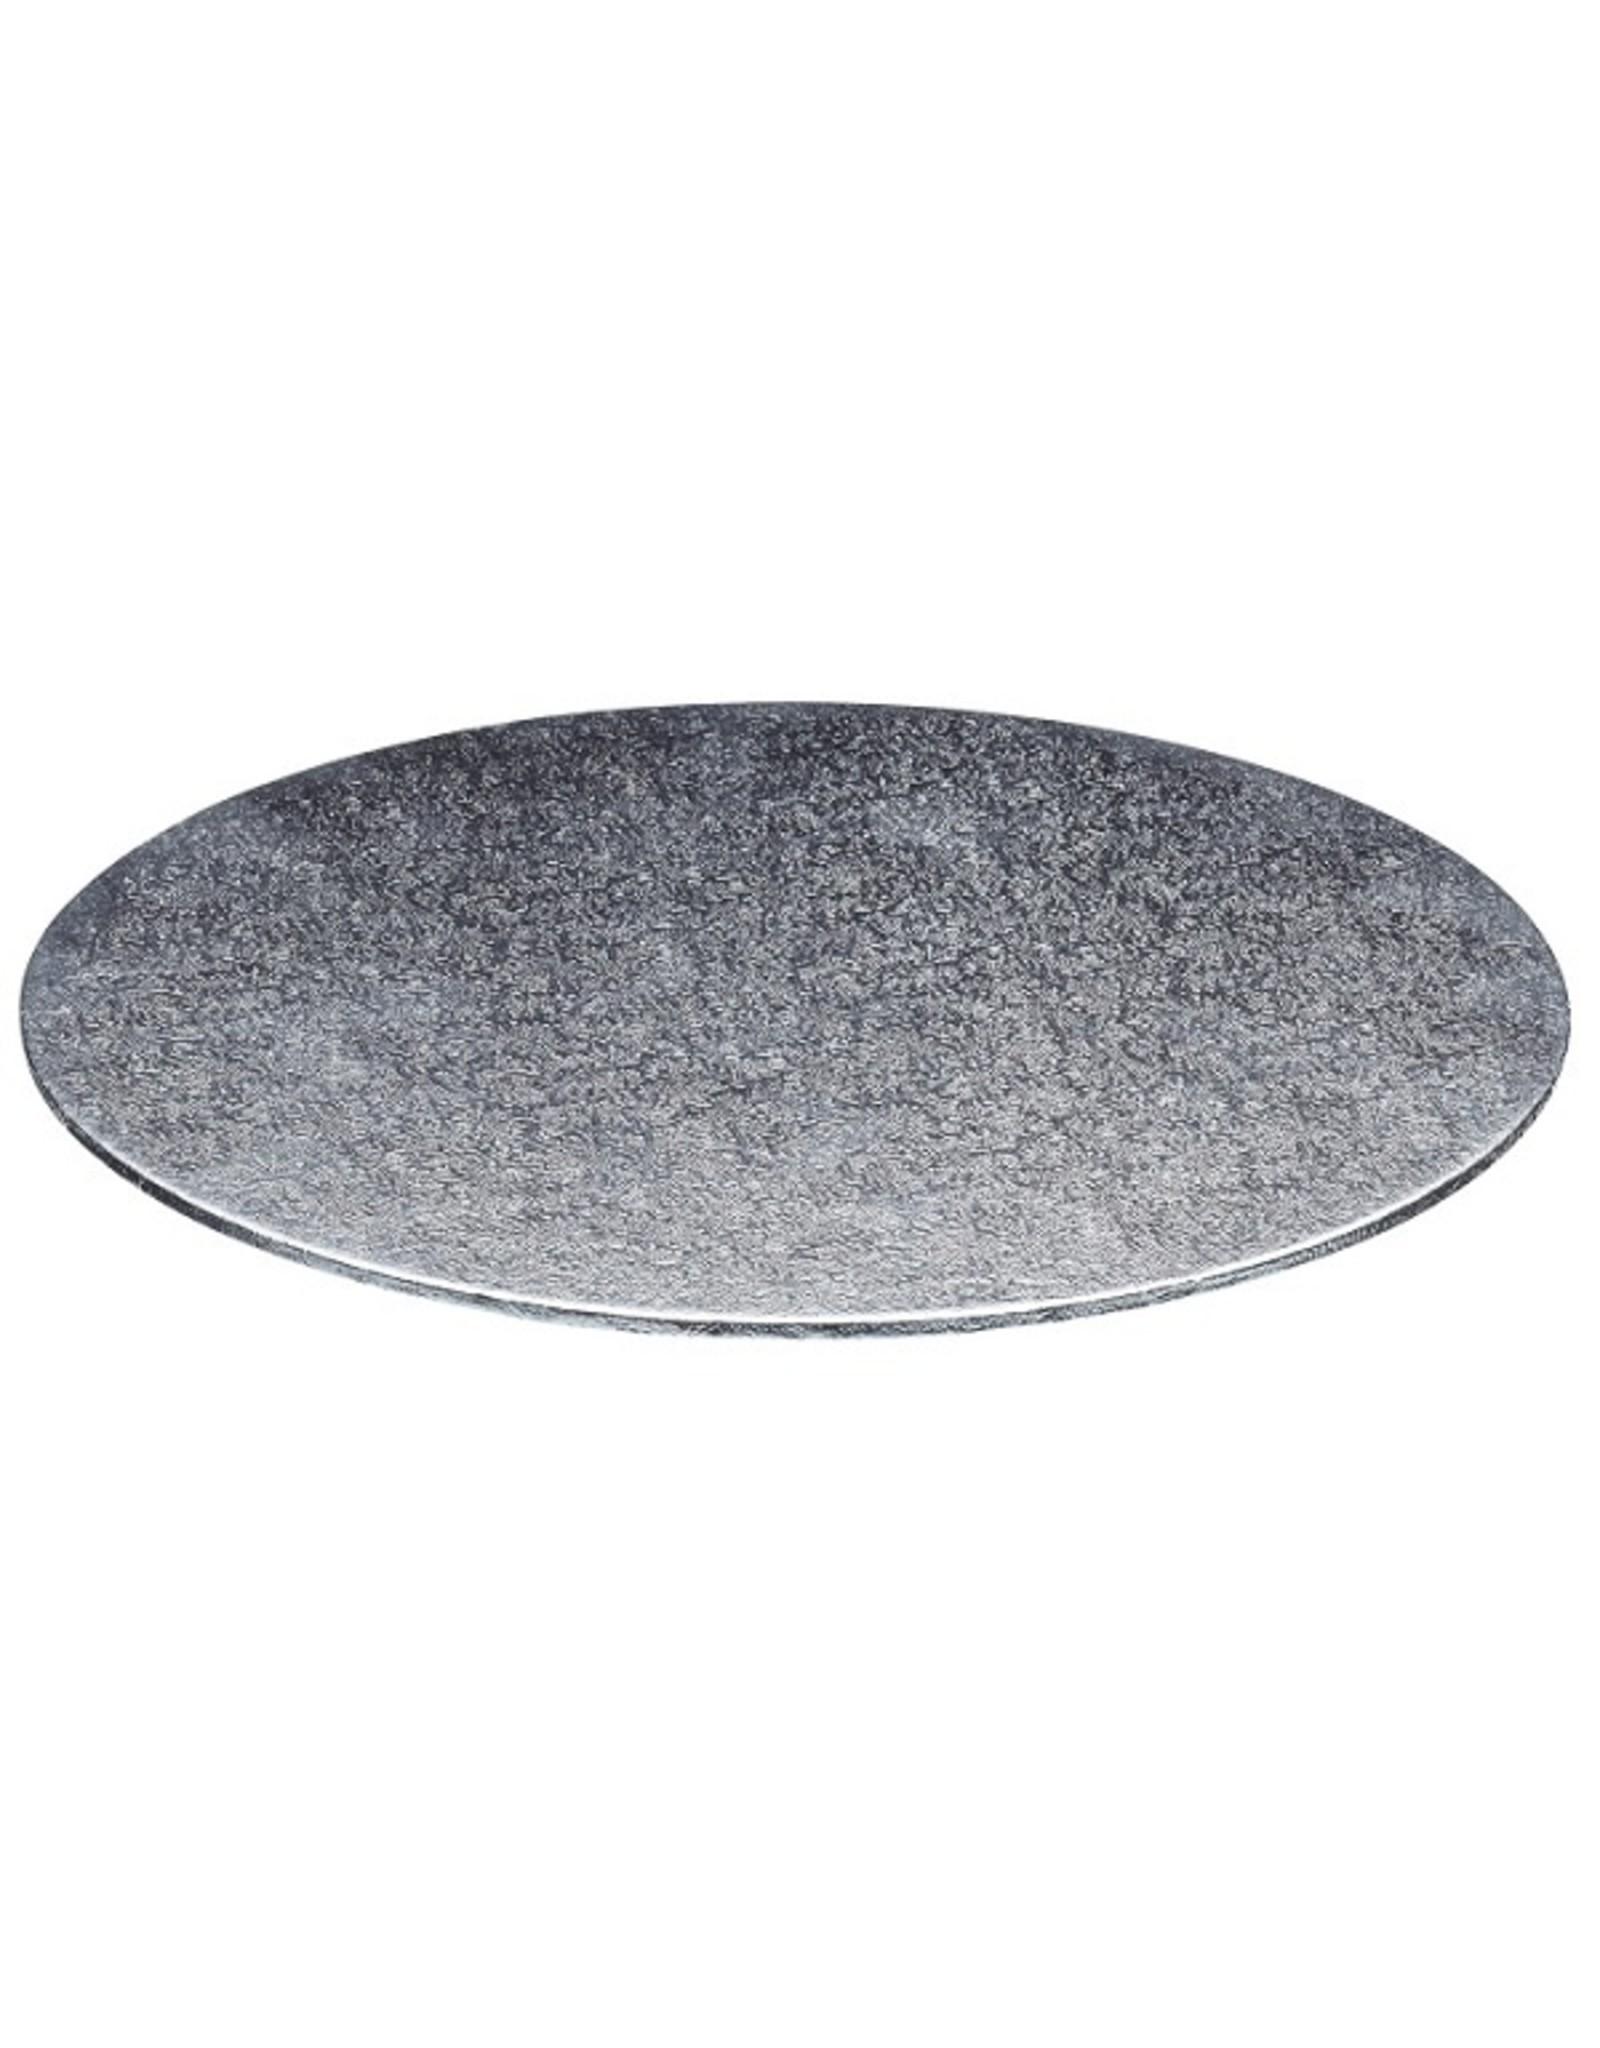 Cake boards Ø178 mm - silver (per 10 pieces)